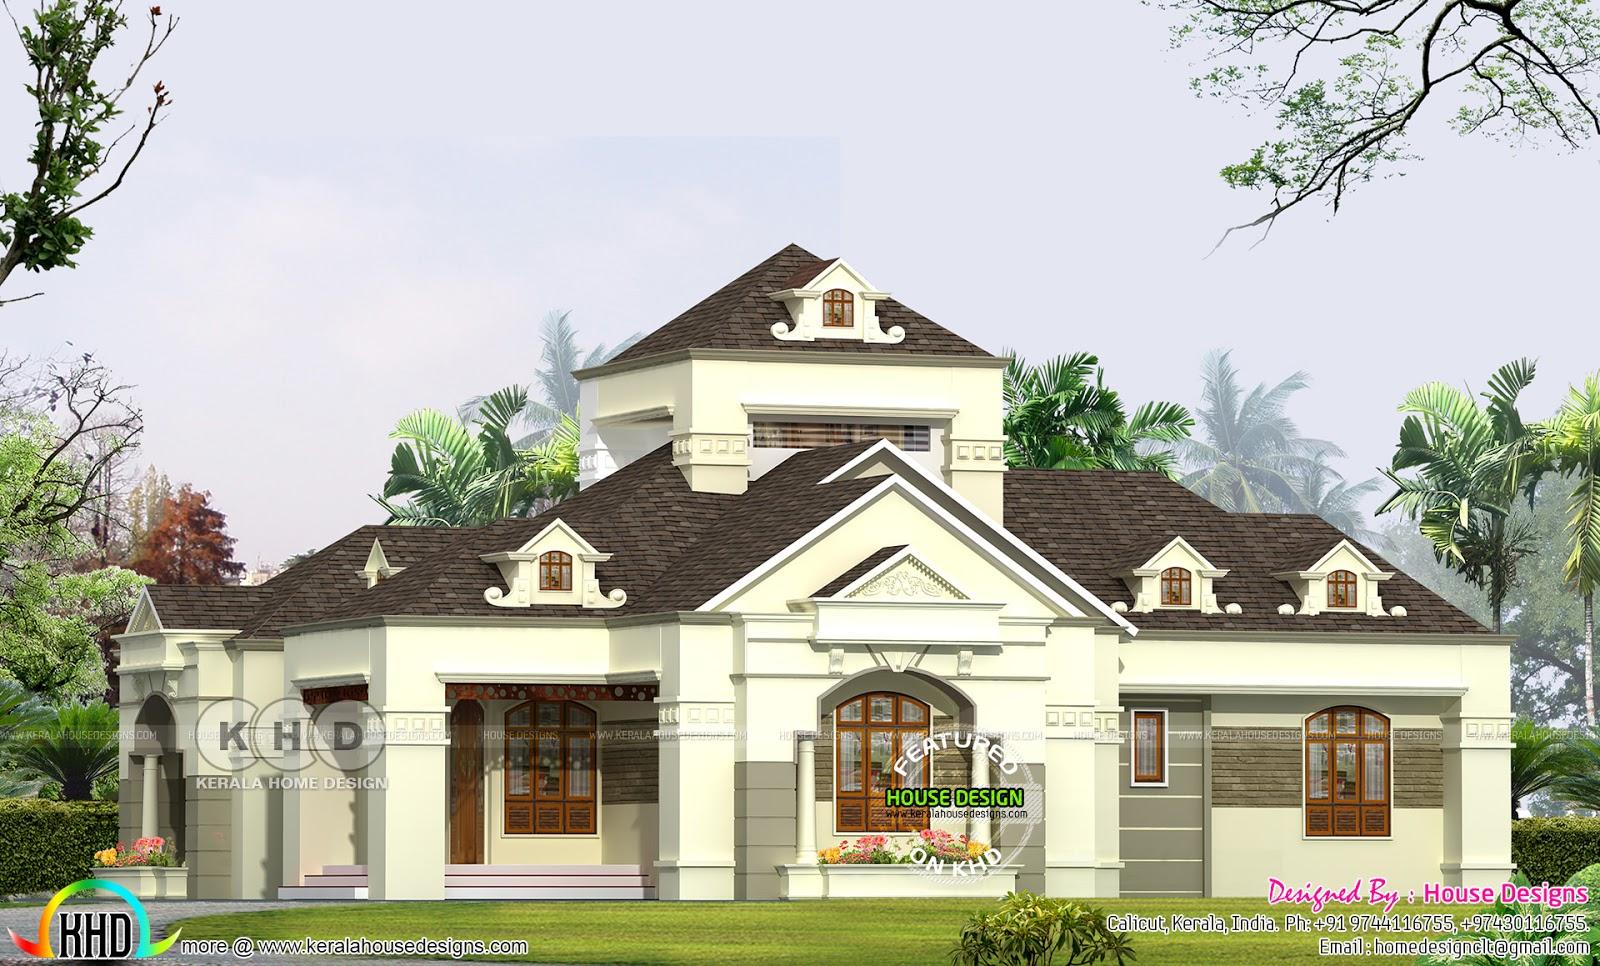 One floor Colonial type villa plan Kerala home design Bloglovin